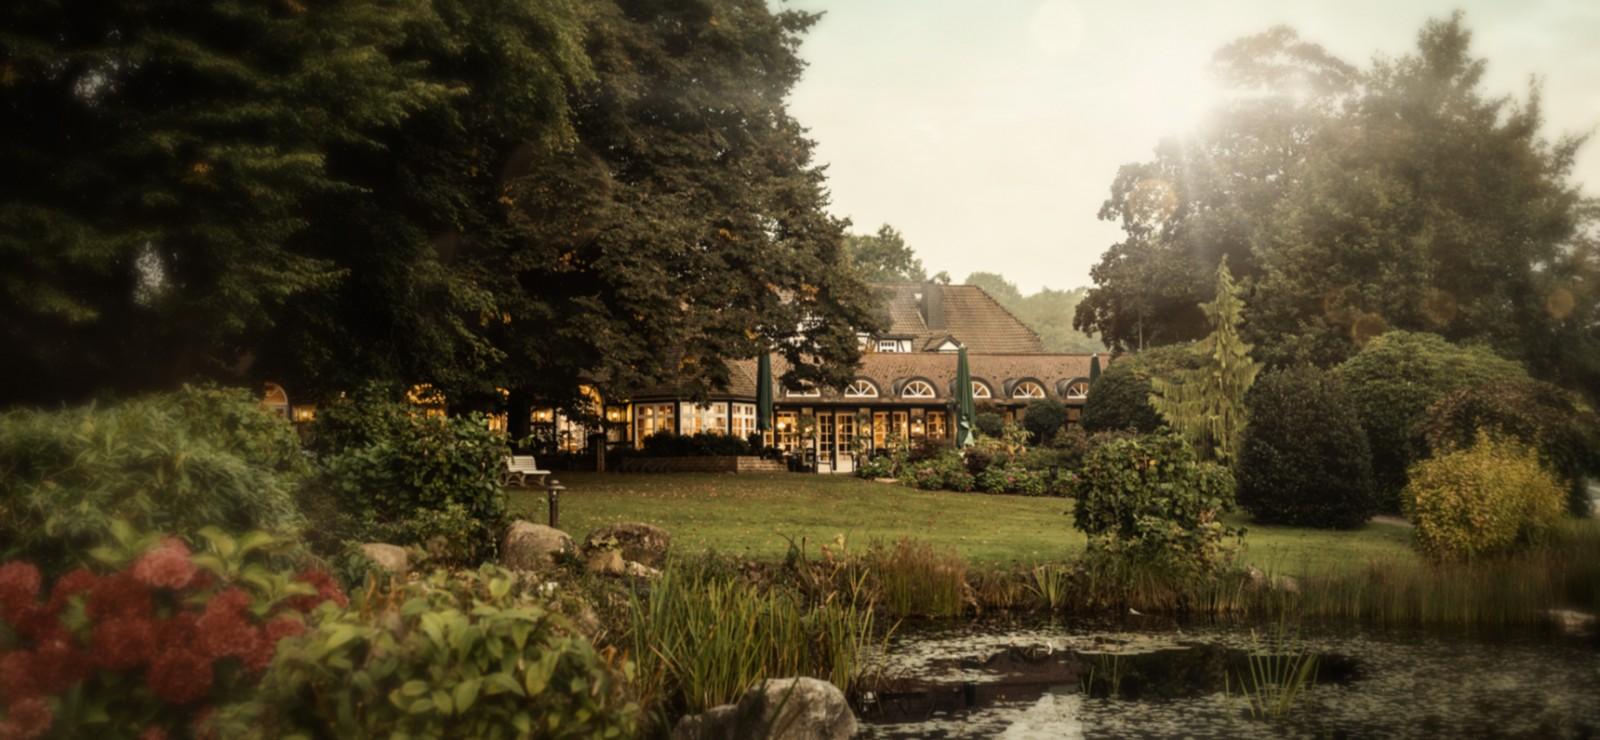 Romantik Hotel Bösehof Bilder | Bild 1